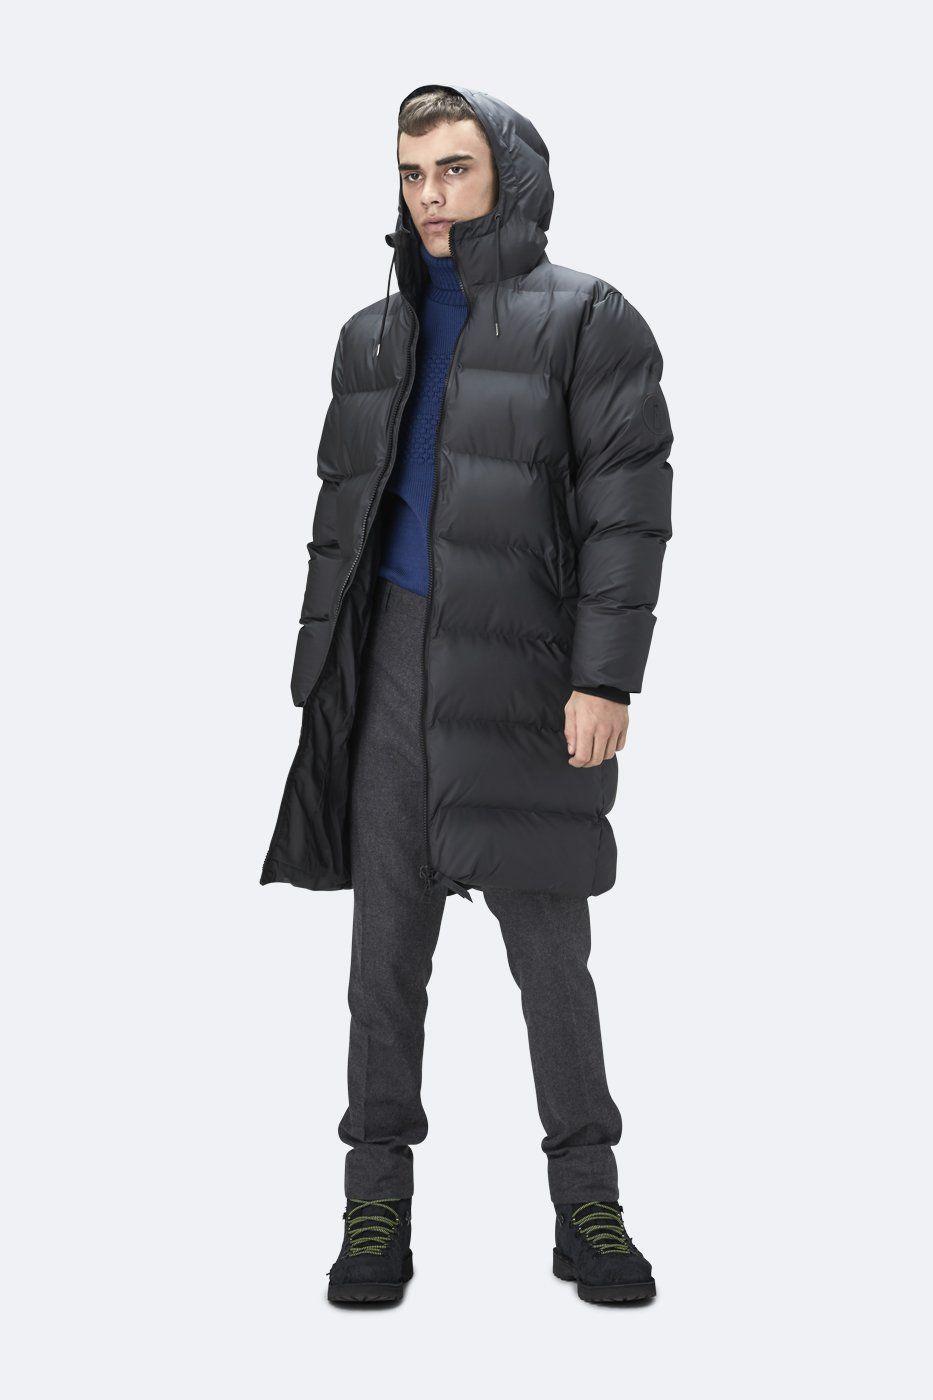 Rains Rains Men S Long Puffer Jacket Rains Cloth Long Puffer Jacket Long Puffer Puffer Jacket Black [ 1400 x 933 Pixel ]